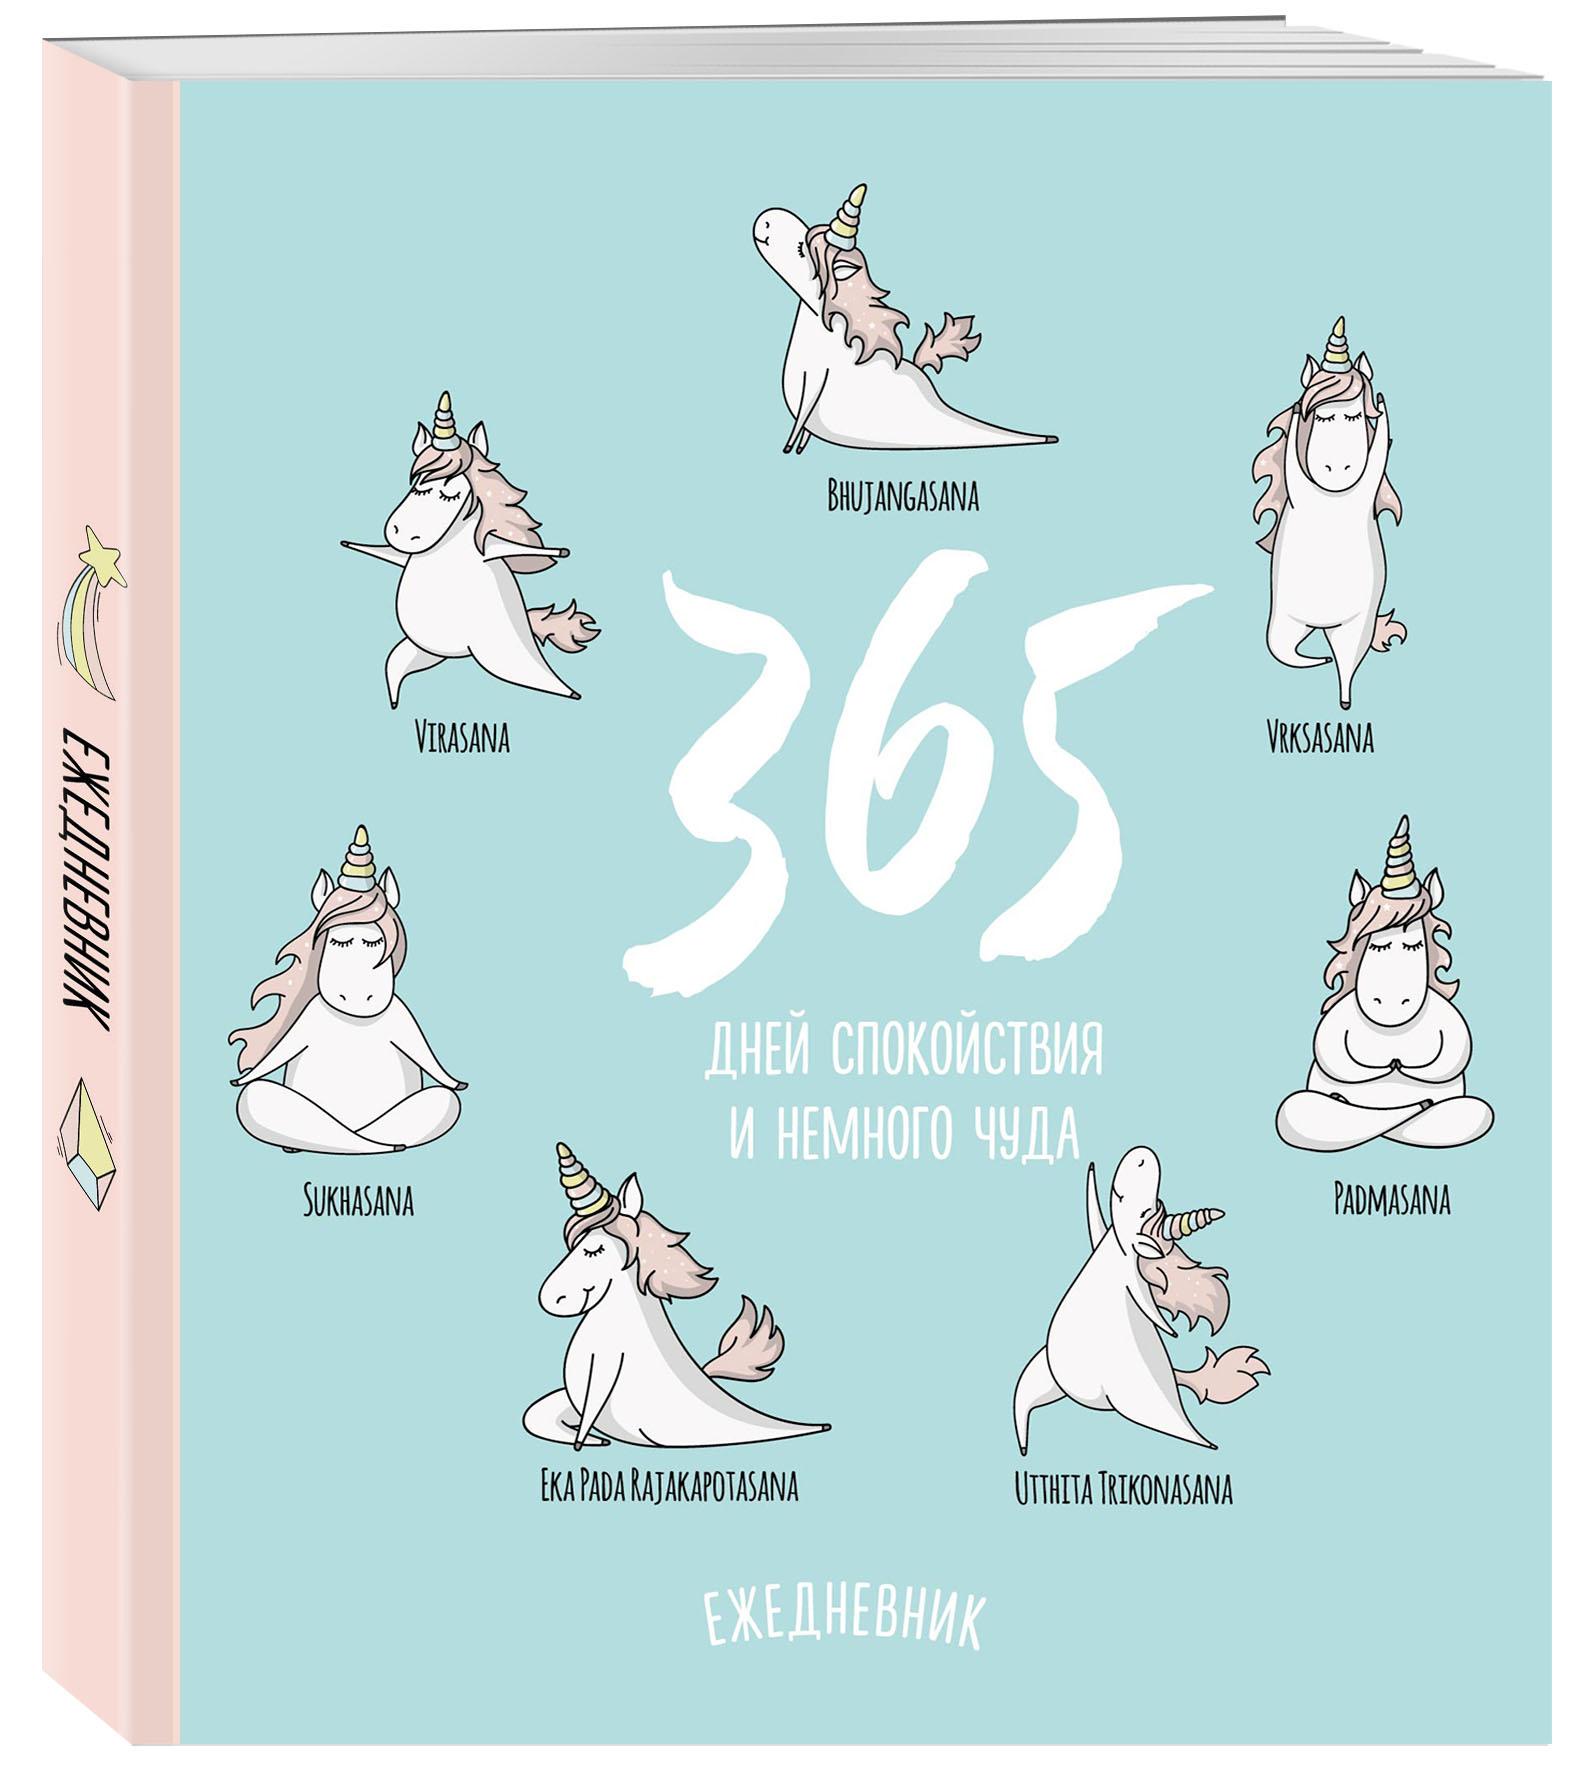 Ежедневник. Единороги (365 дней спокойствия), 140х155мм, мягкая обложка, SoftTouch, 160 стр.